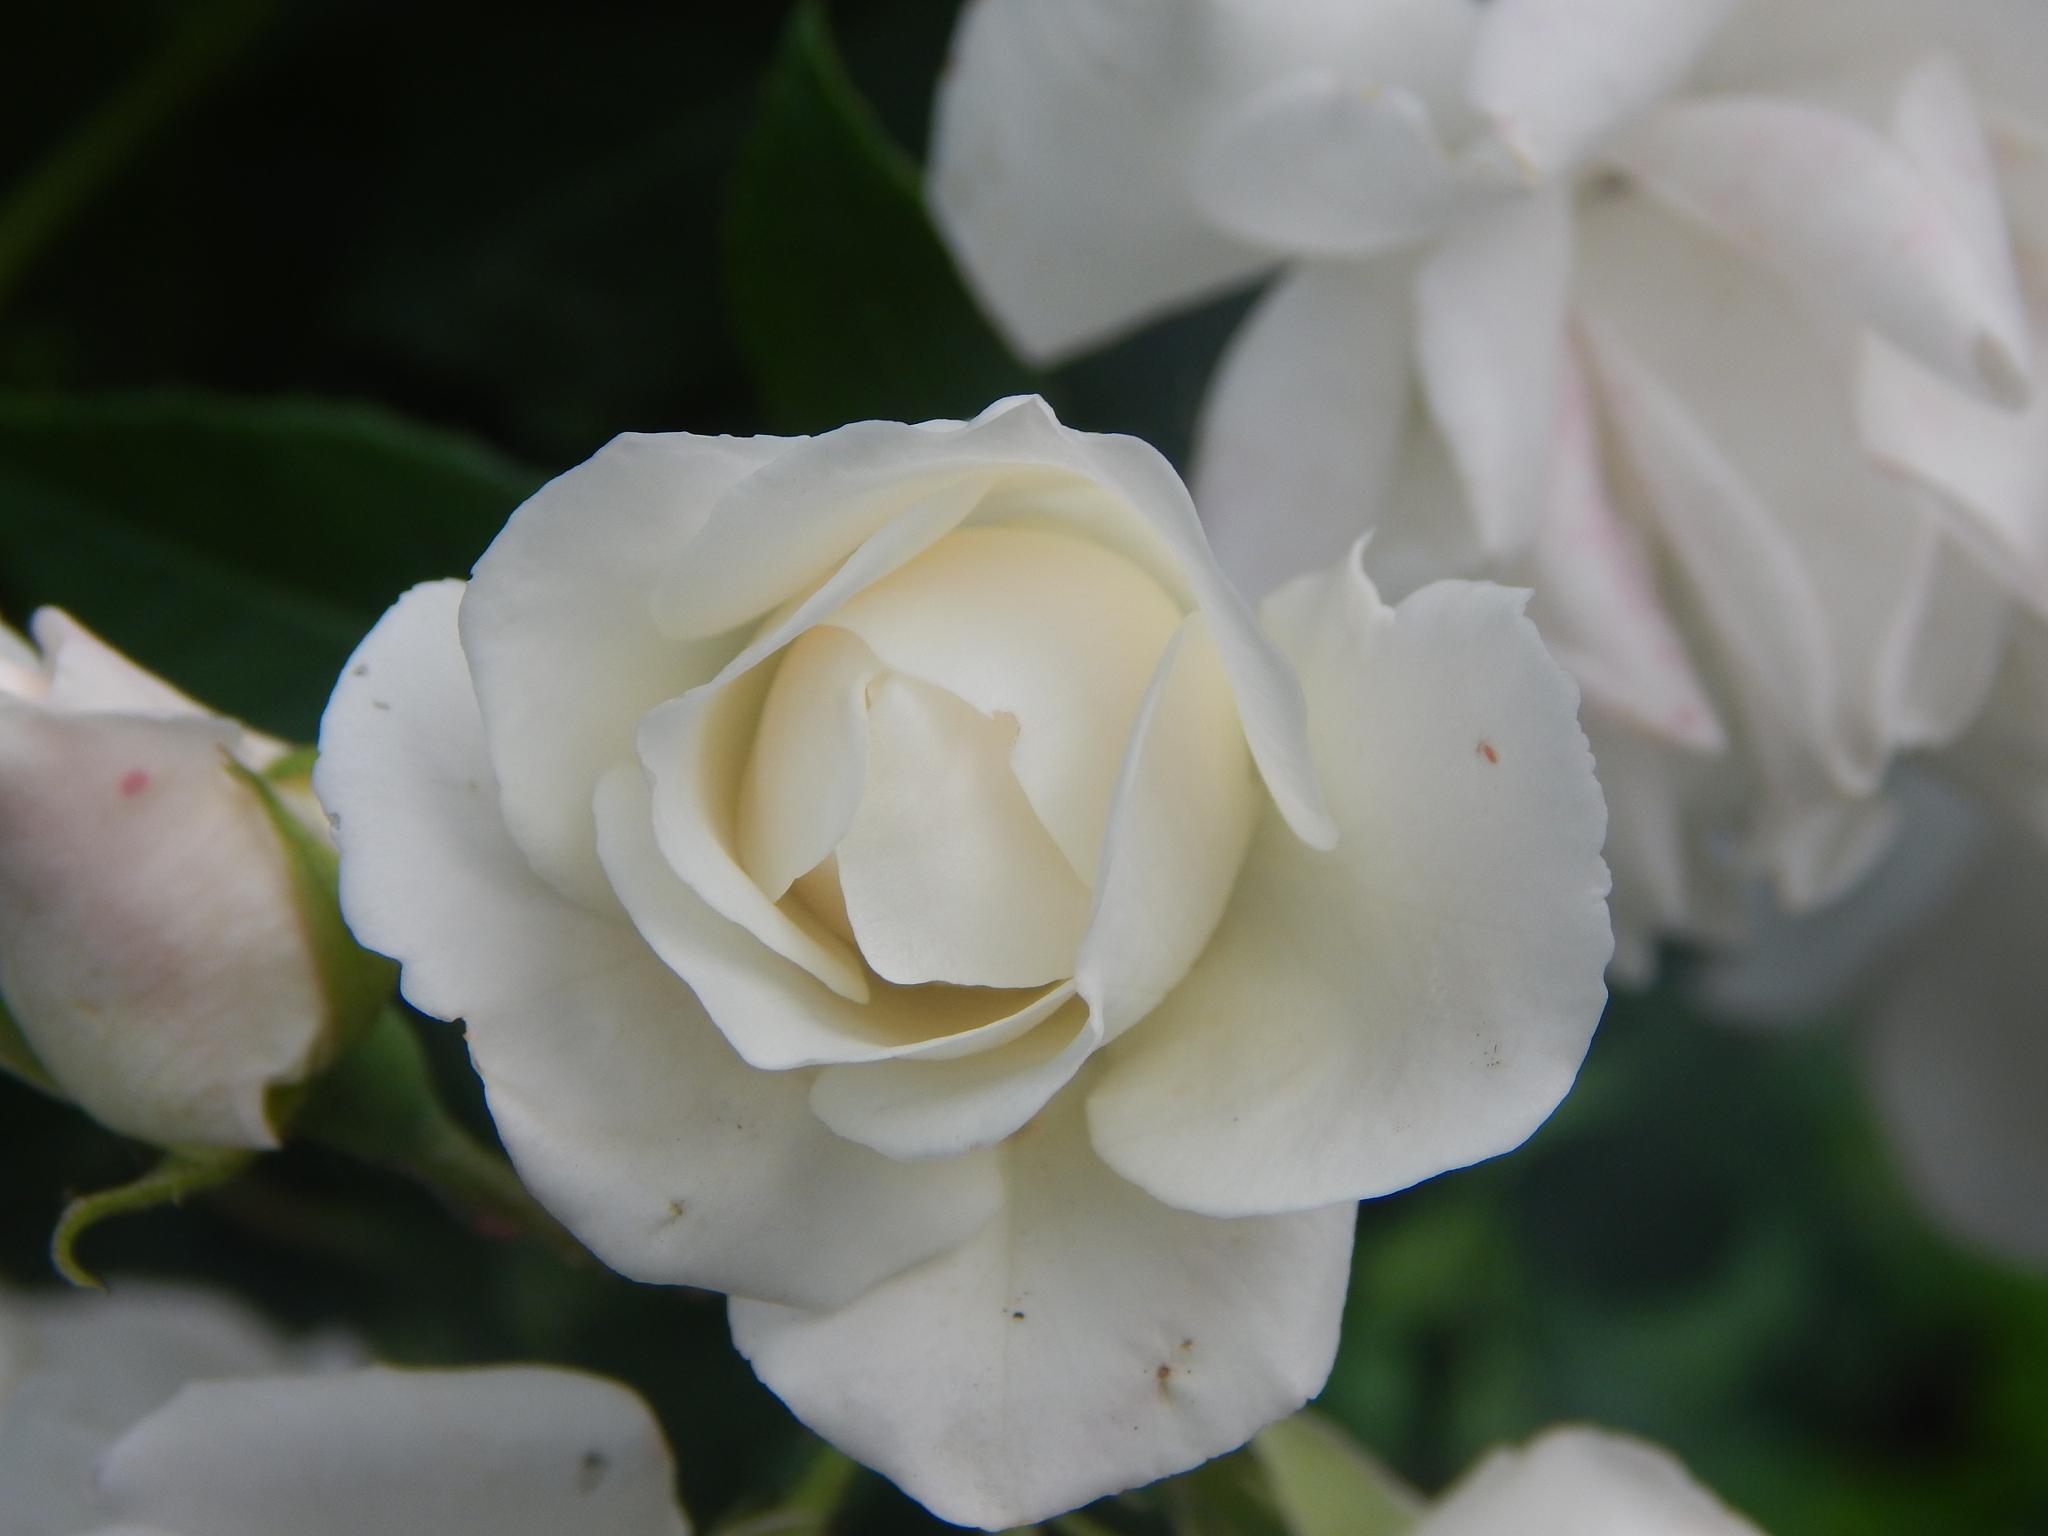 white rose by Goran Vuletic